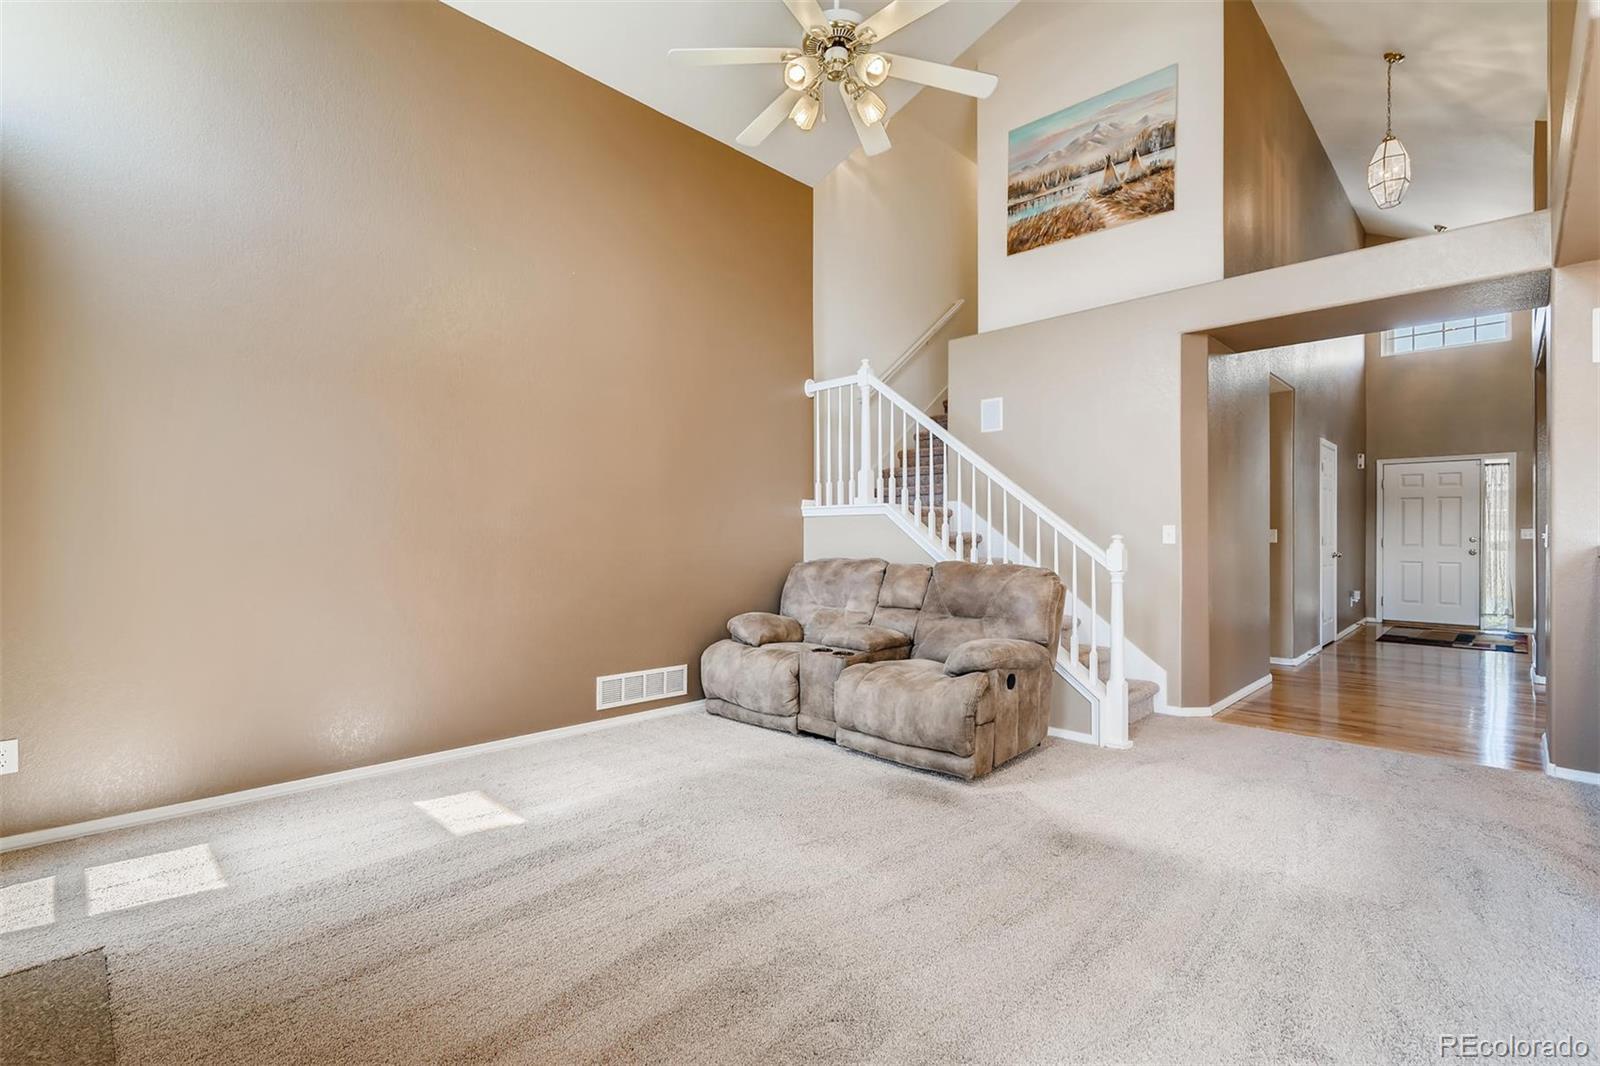 MLS# 9724731 - 15 - 498 Promontory Drive, Loveland, CO 80537